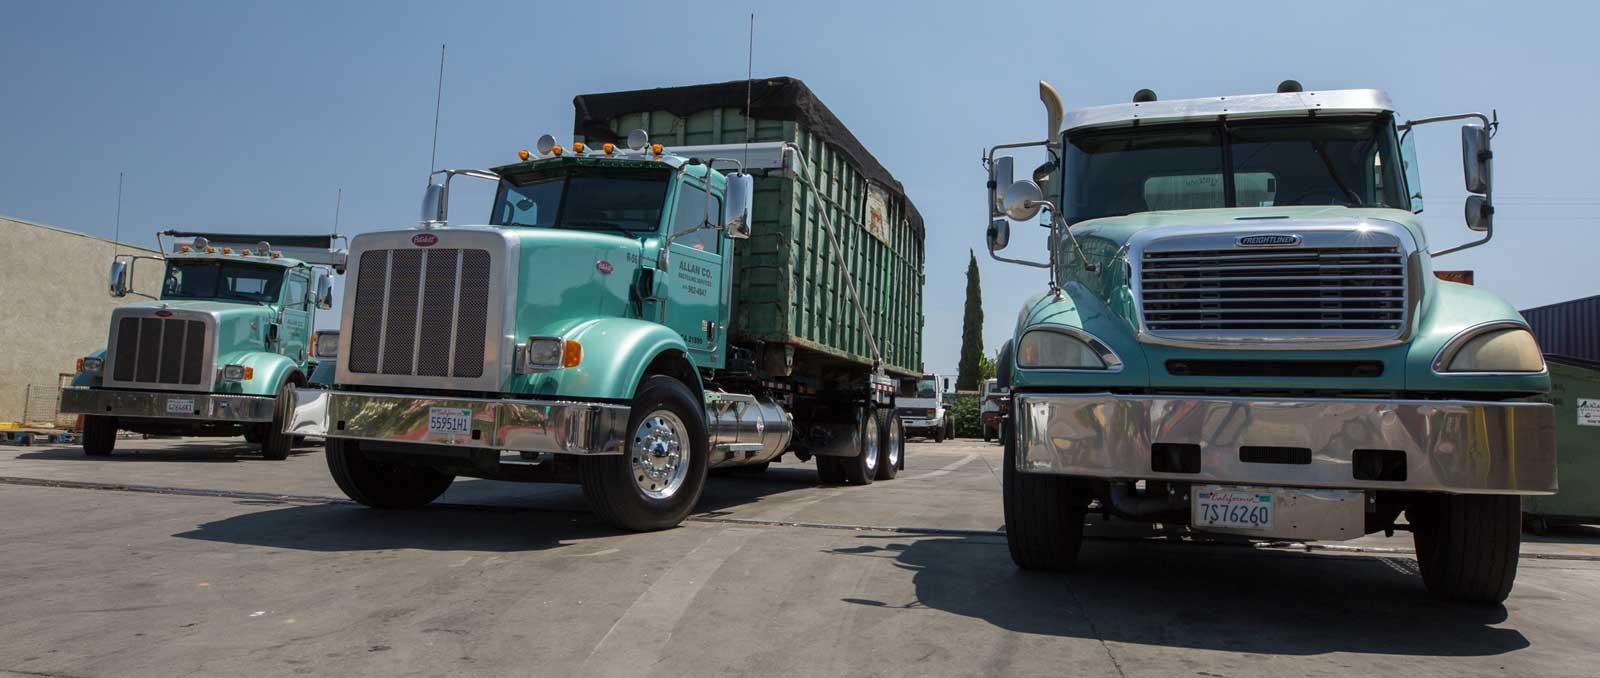 Allan Compant Recycling Trucks